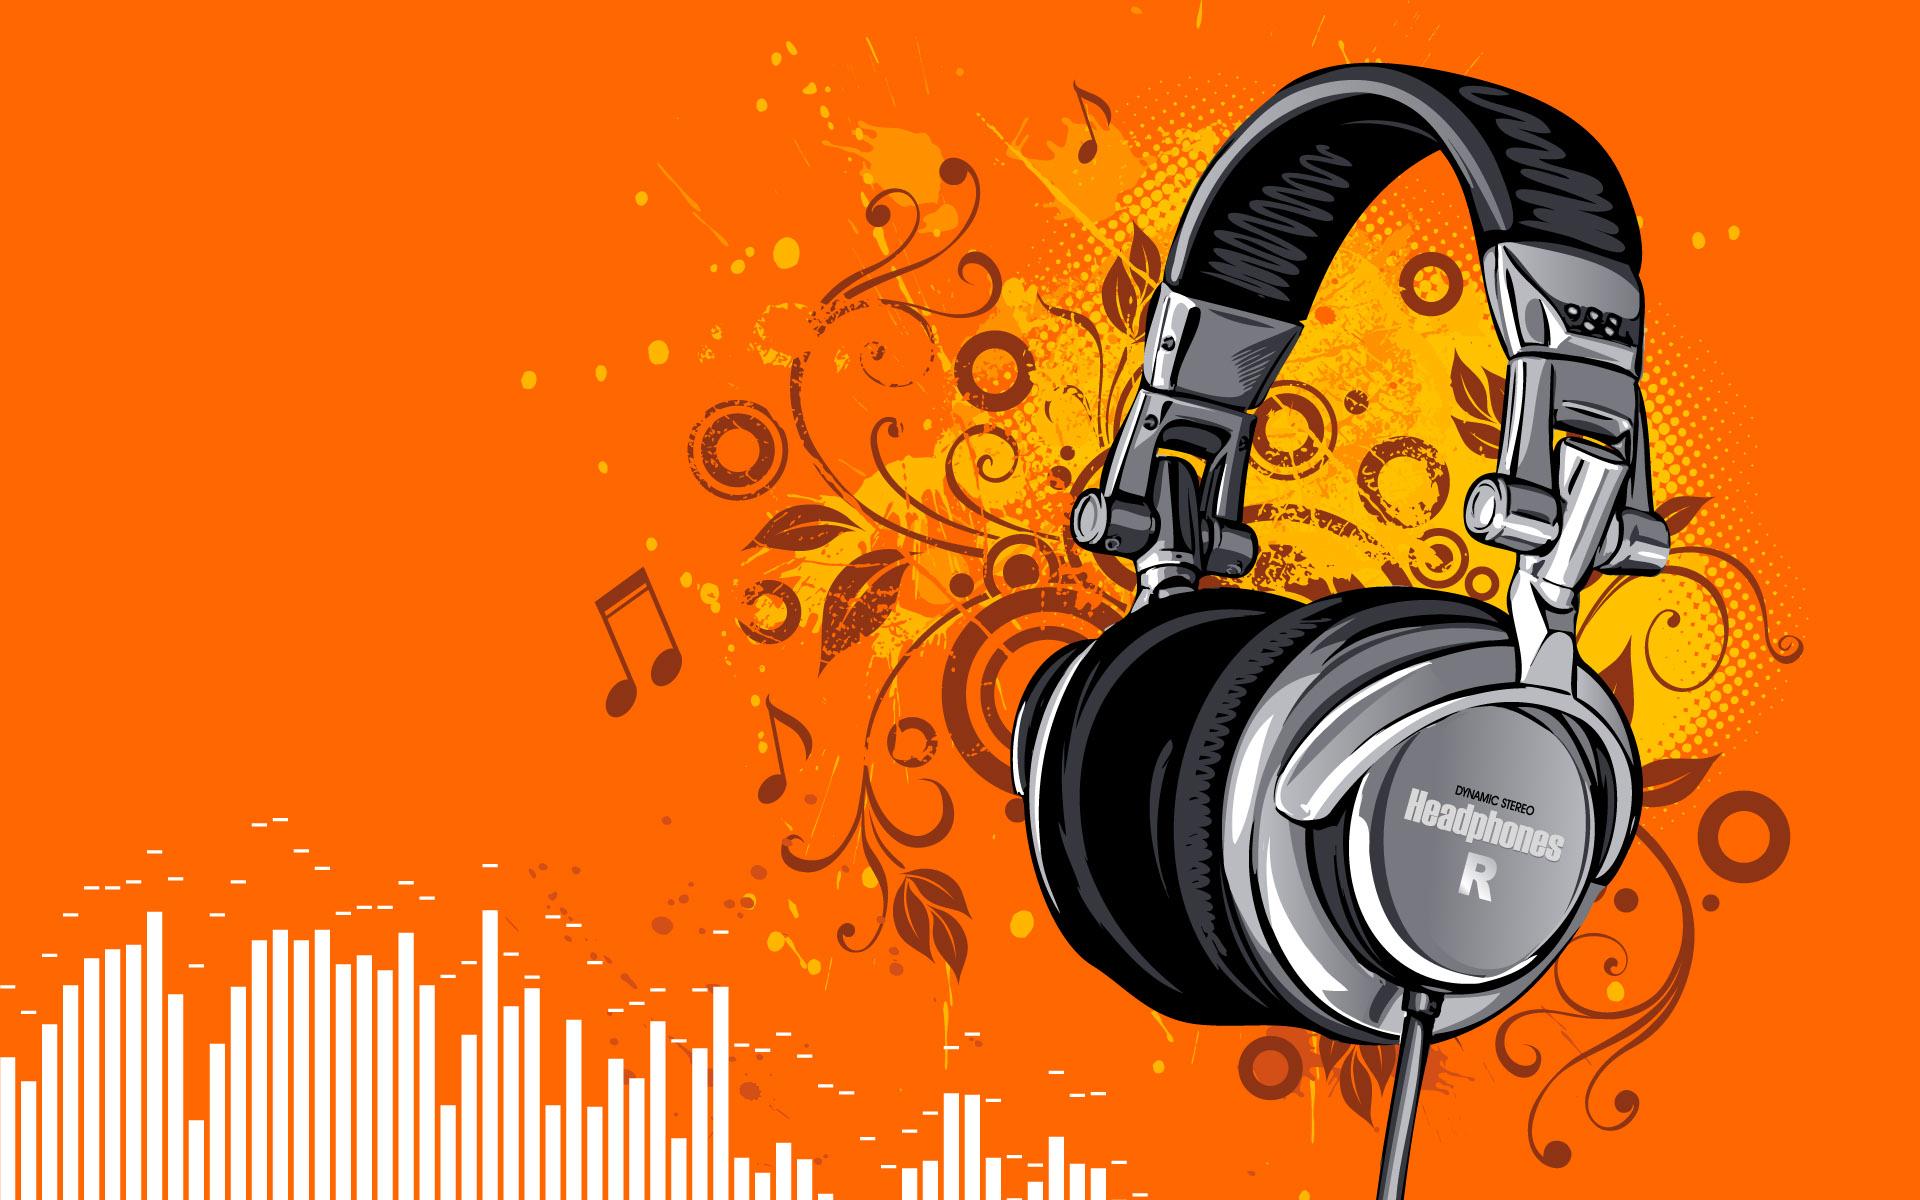 Download Music Mix: HipLife Replay Mixtape 2 by Emmalex